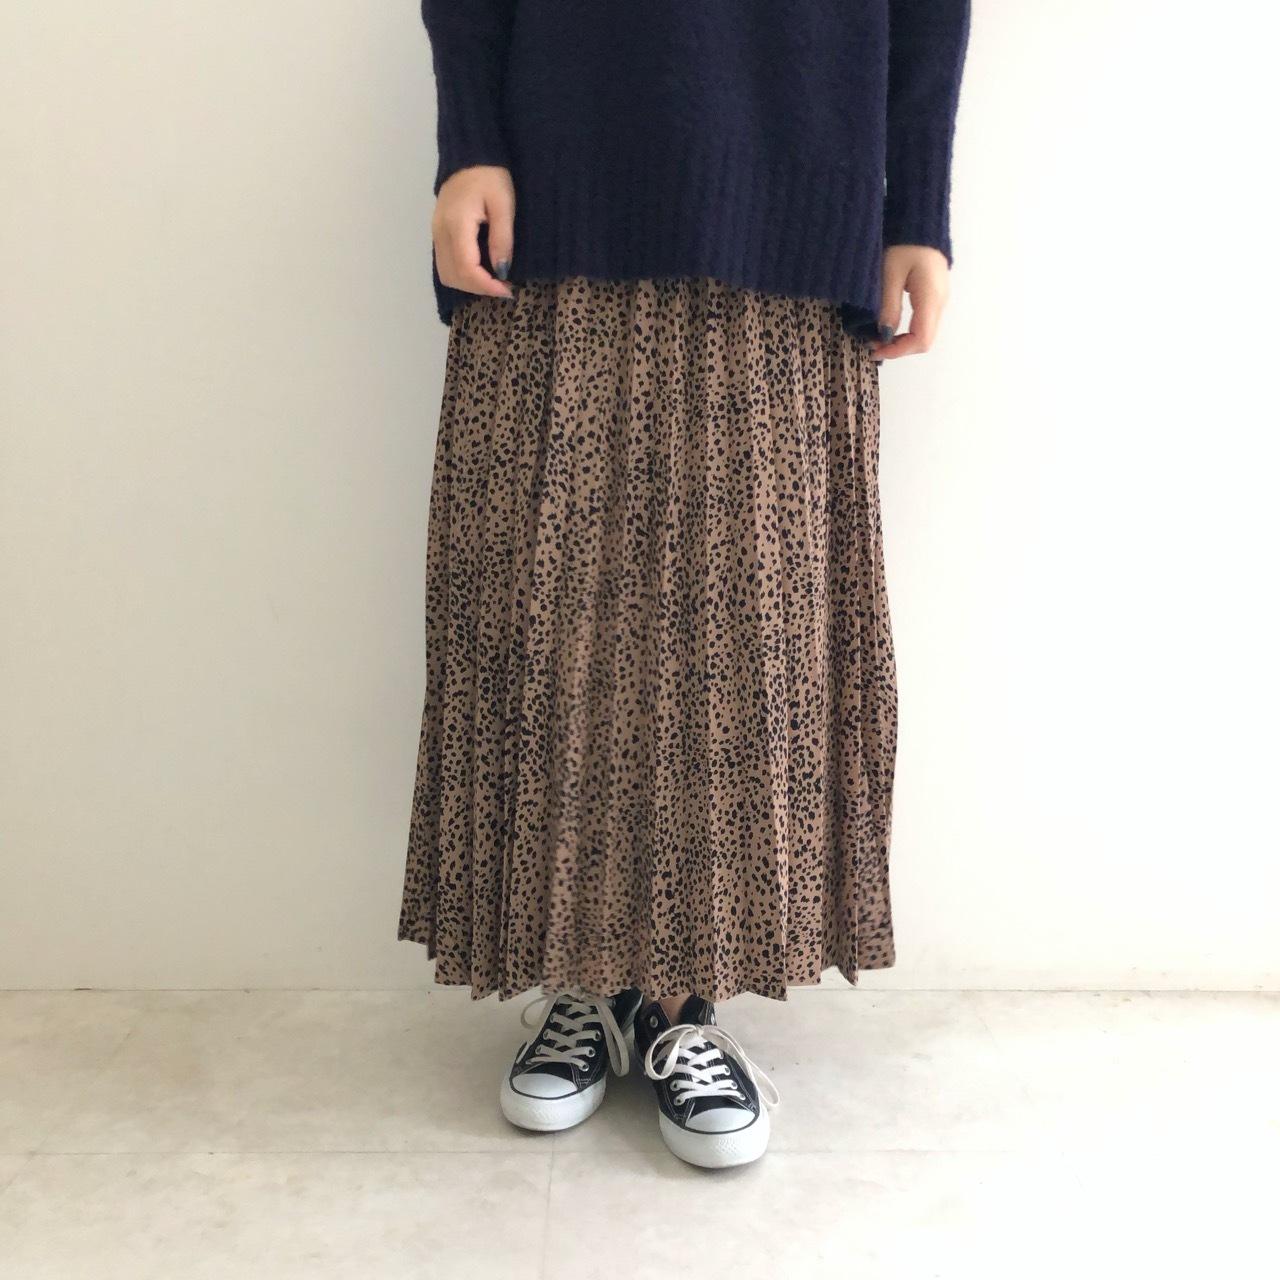 【 CYNICAL 】- 952-96060 - レオパードプリーツスカート